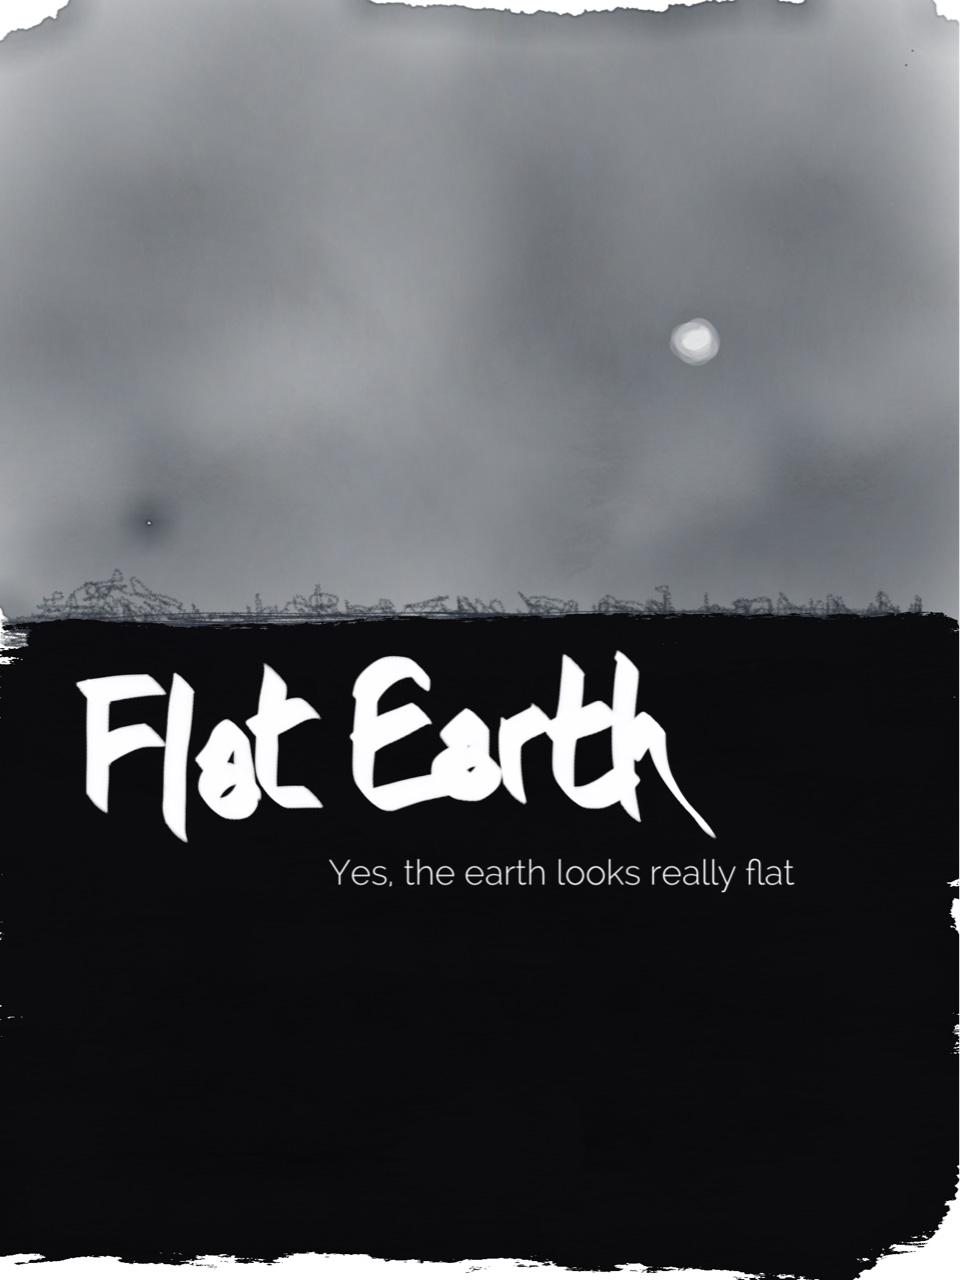 Flat Earthers